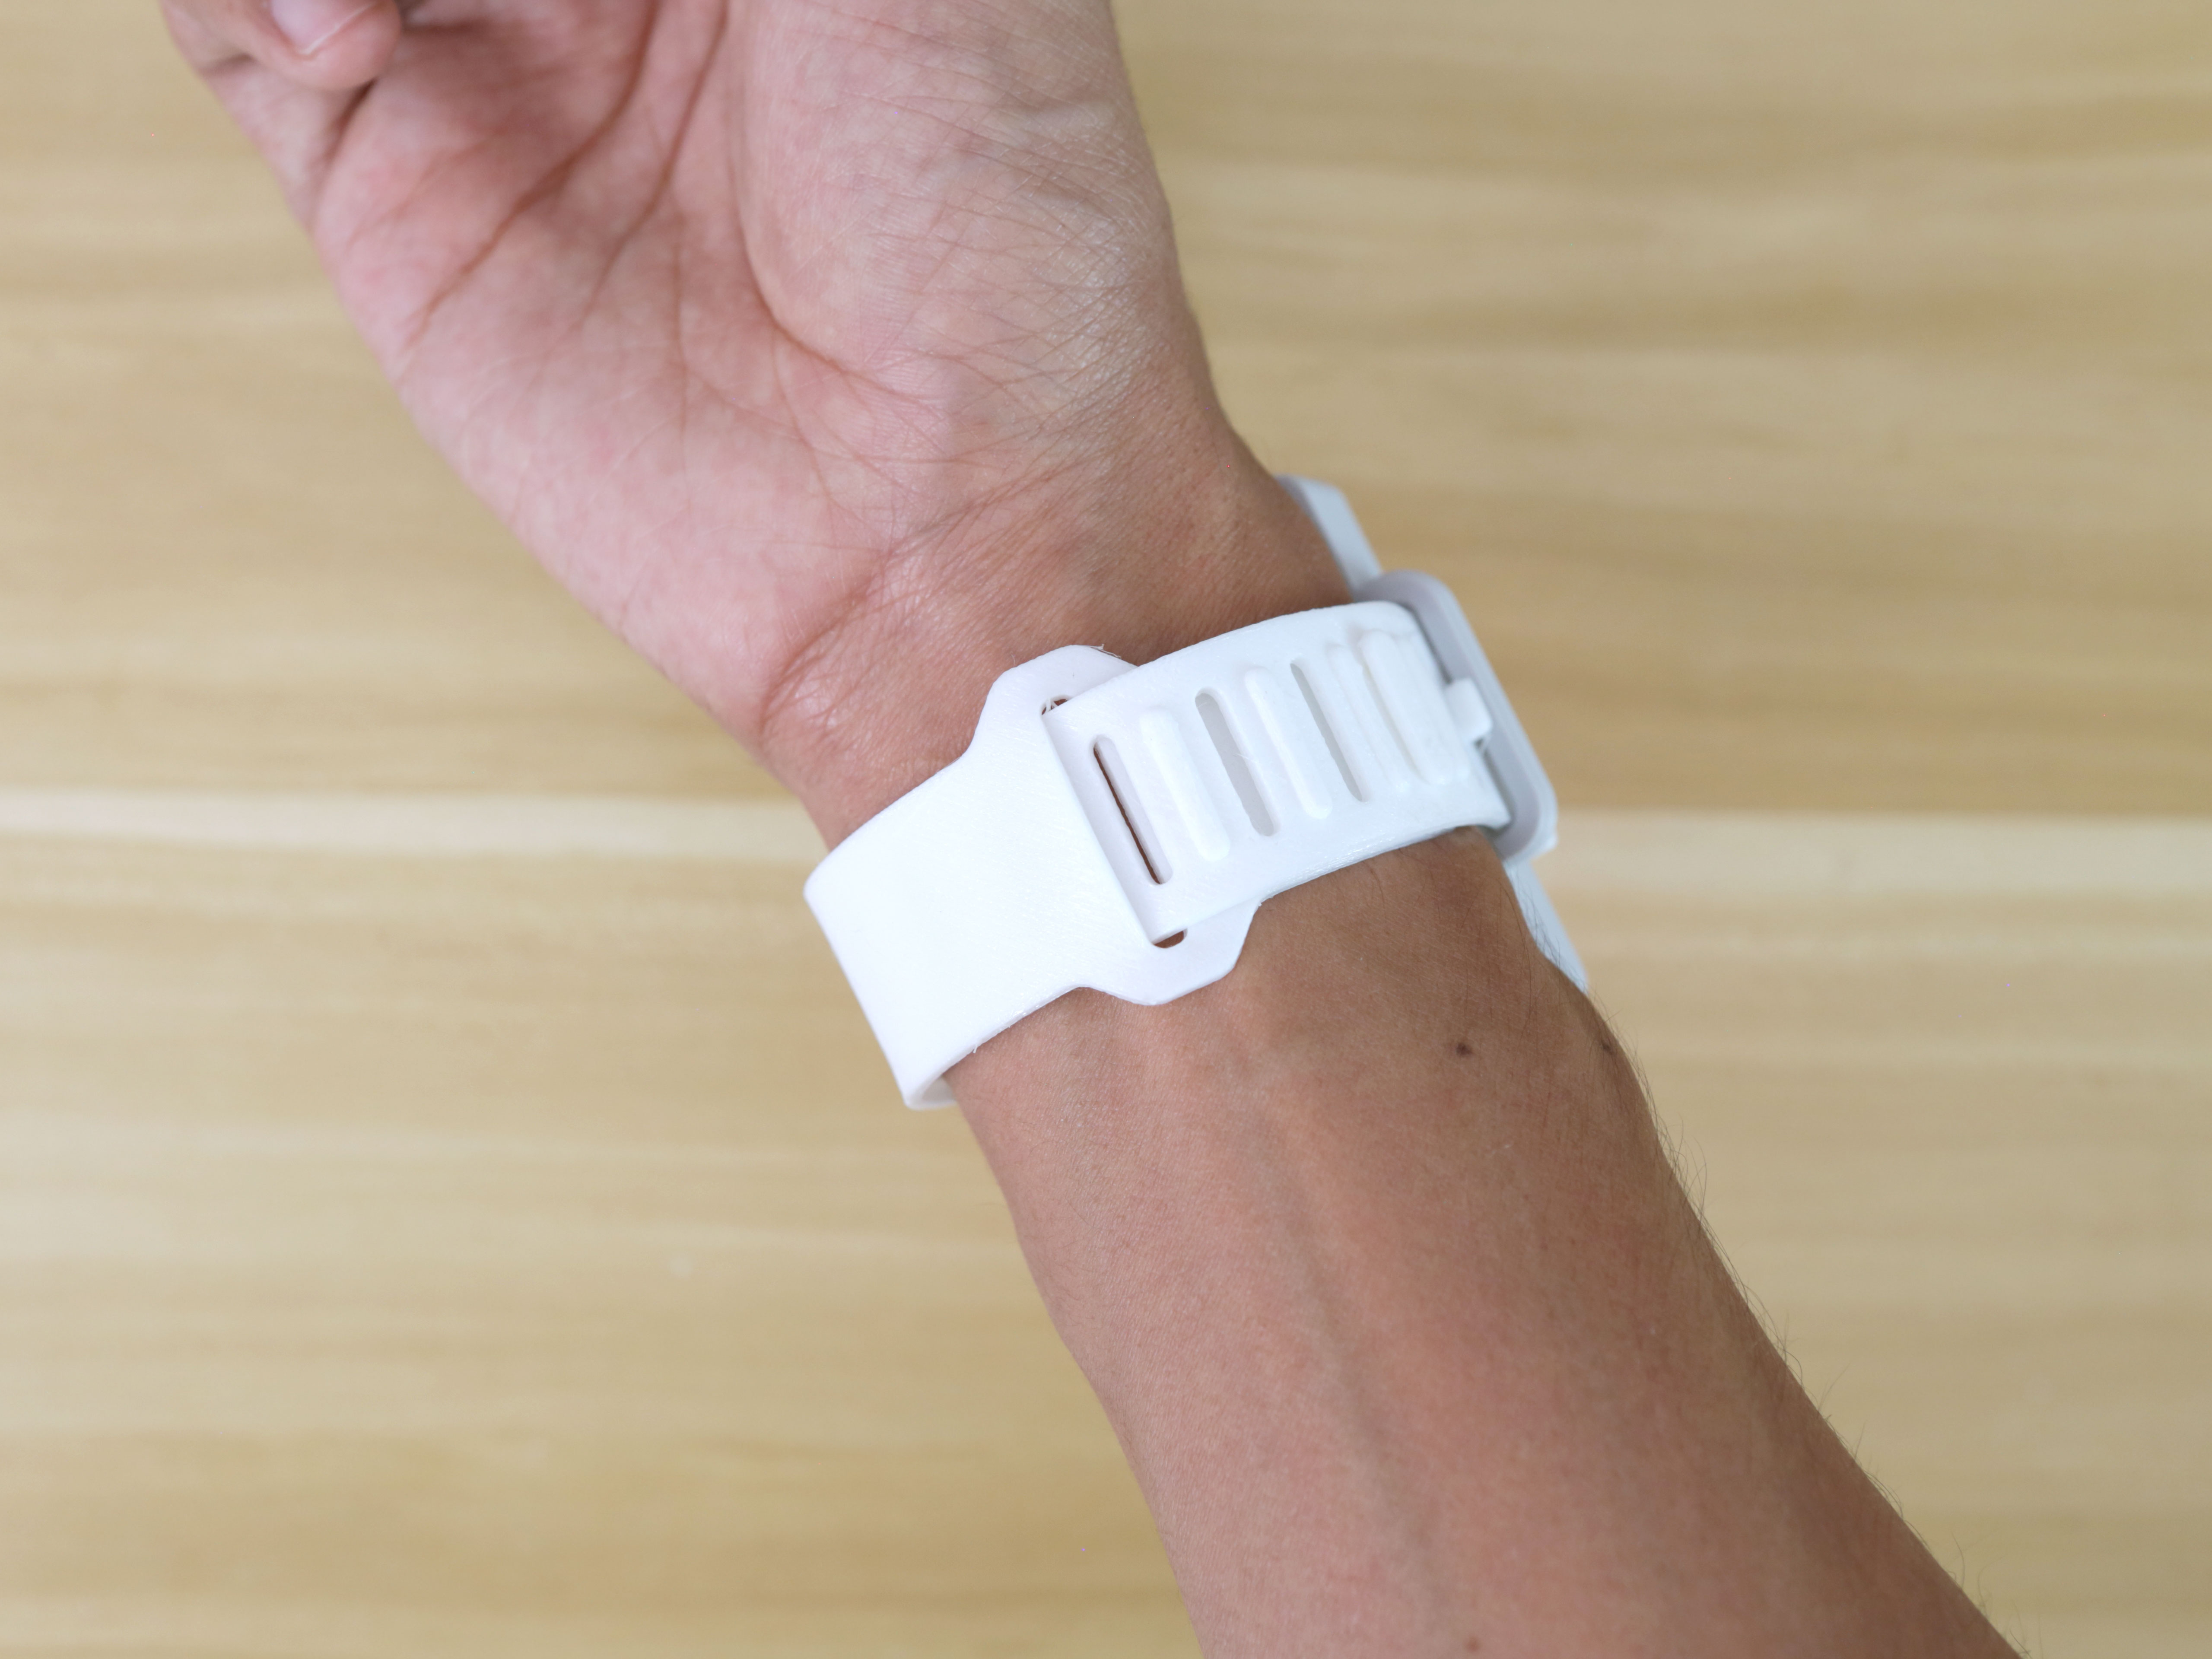 3d_printing_wrist-wear.jpg